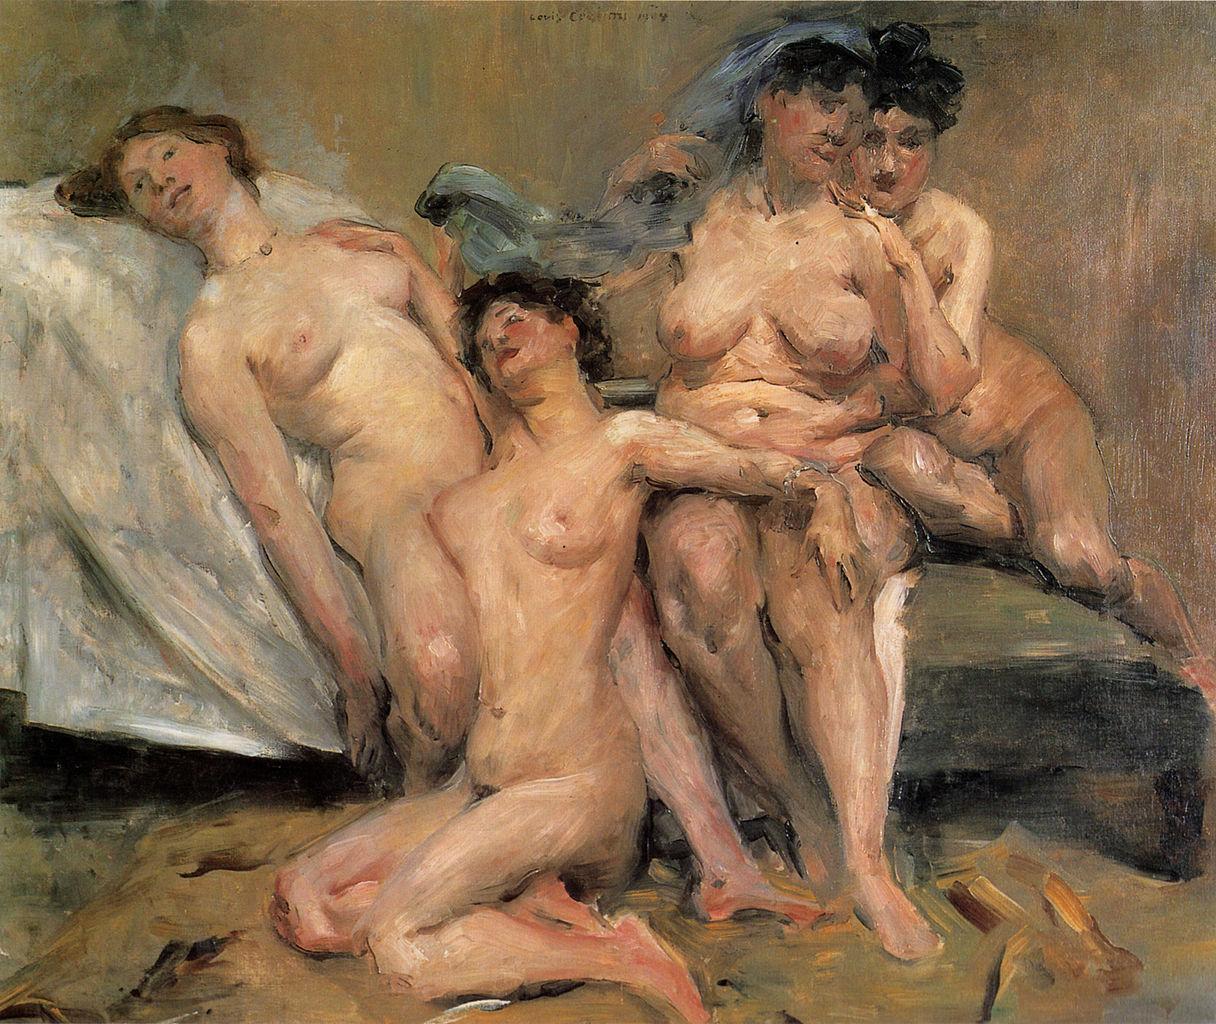 File:Lovis Corinth Frauengruppe 1904.jpg - Wikimedia Commons